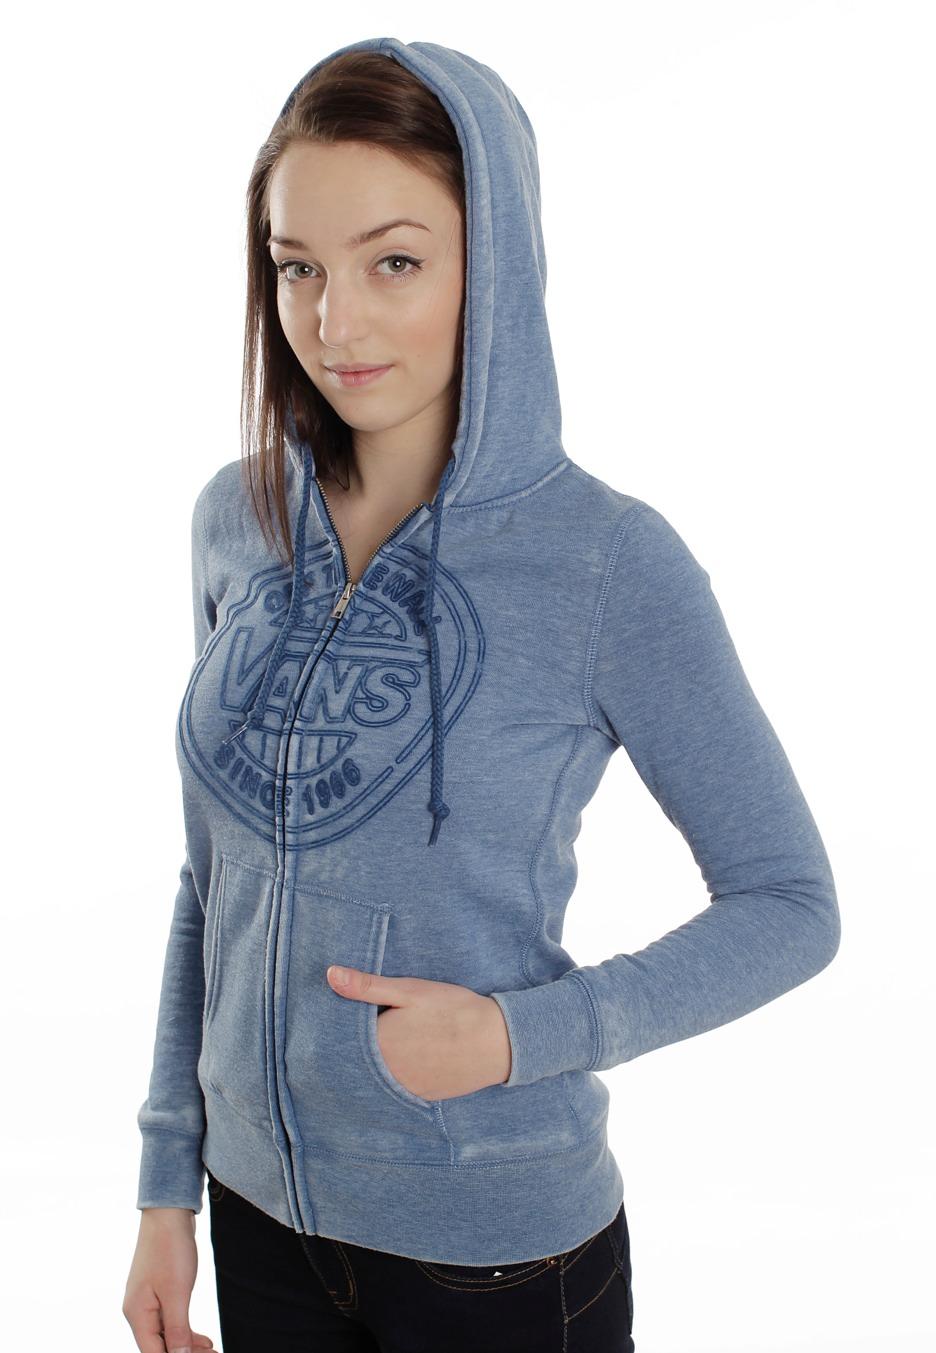 Vans - Neon Hoody Saphire - Girl Zipper - Impericon.com US db5fc0f34